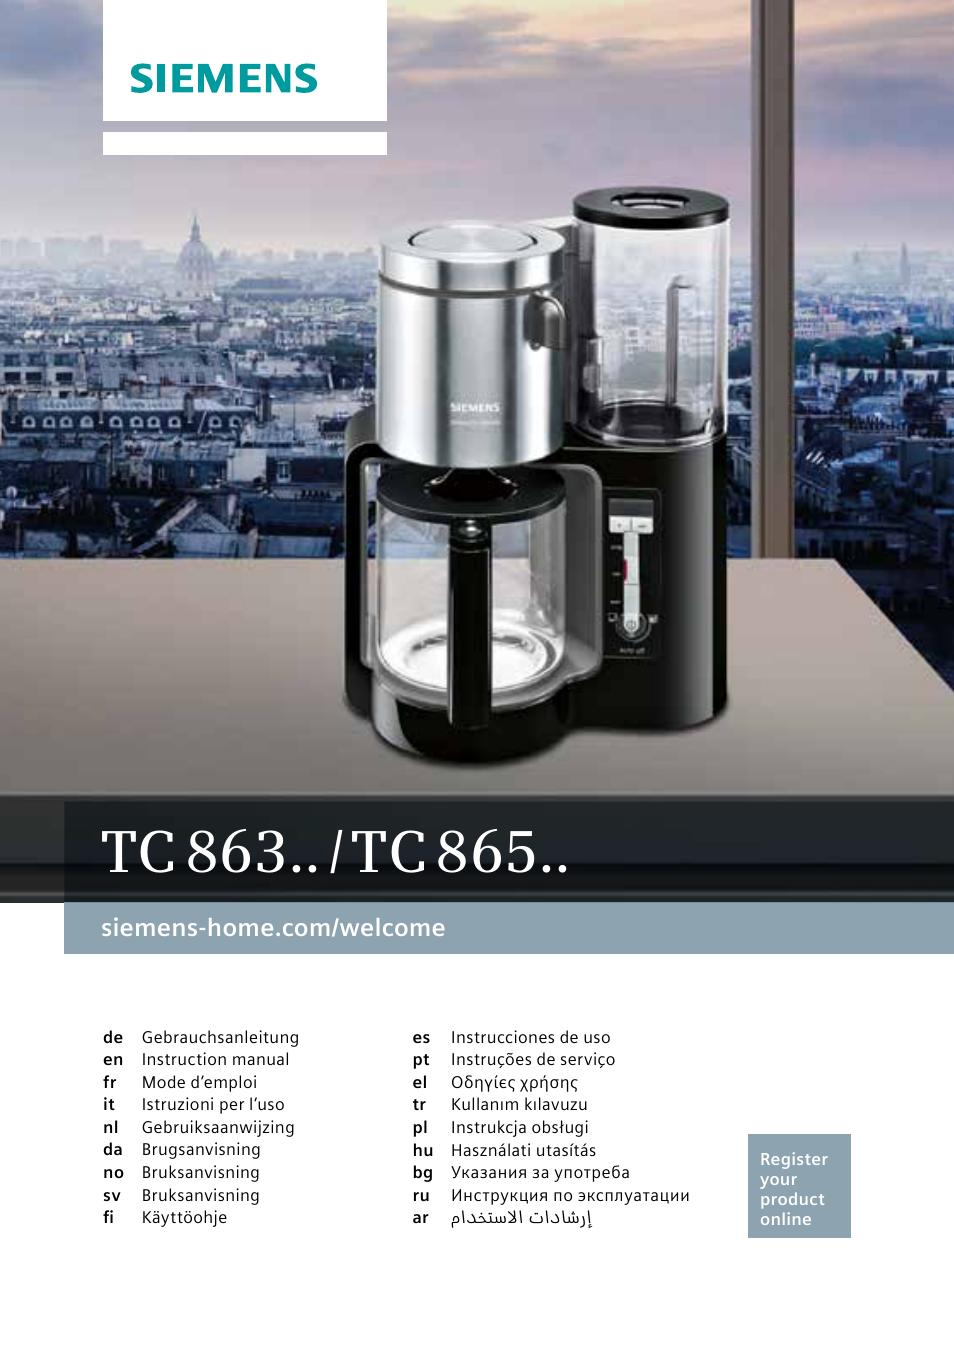 siemens tc86303 user manual 132 pages also for tc86503 tc86304 rh manualsdir com siemens home appliances user manuals Siemens Fridge